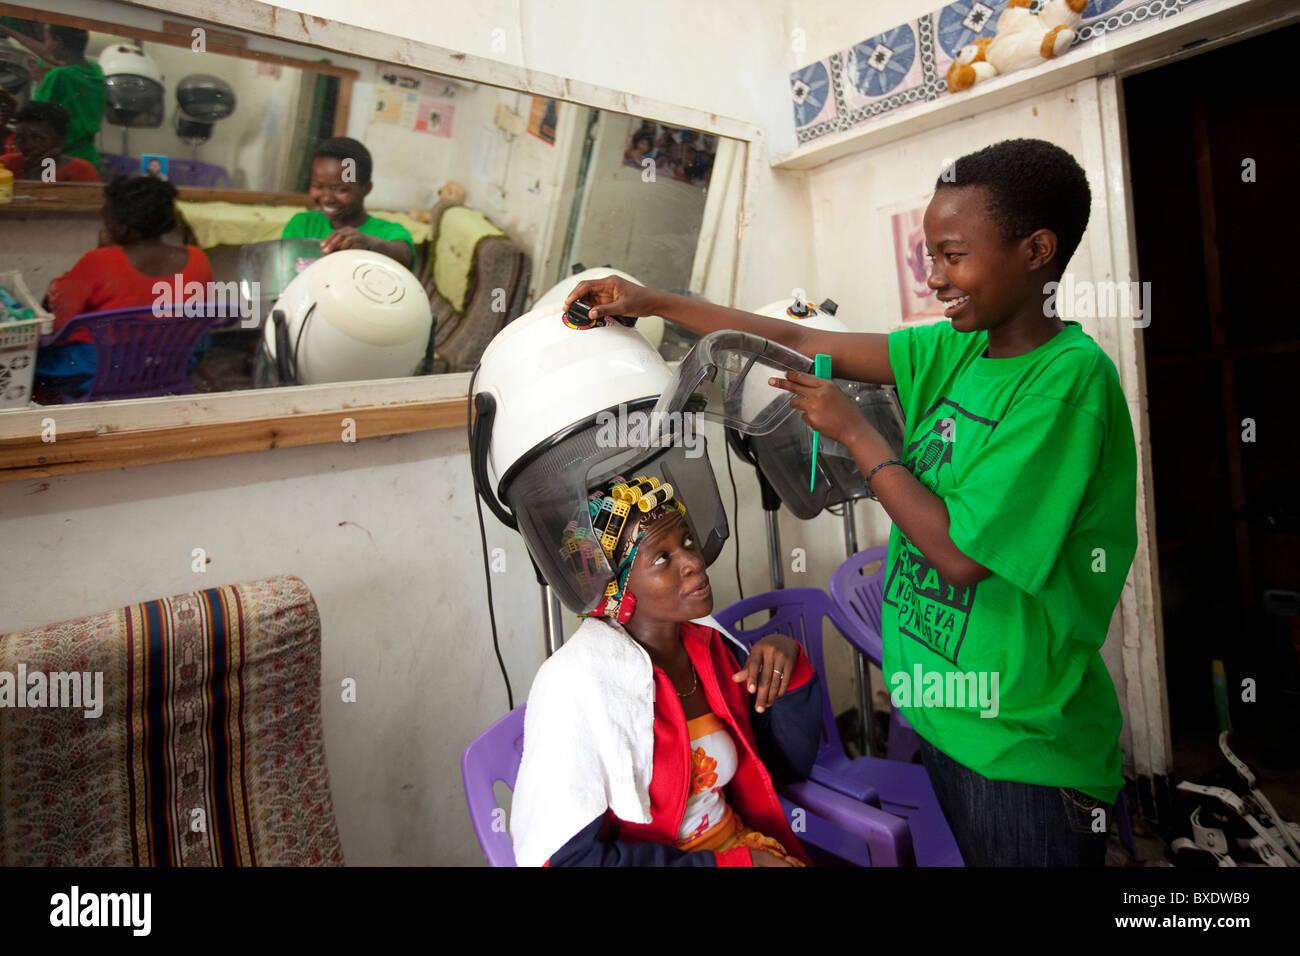 Women's hair salon in Dodoma, Tanzania, East Africa. - Stock Image